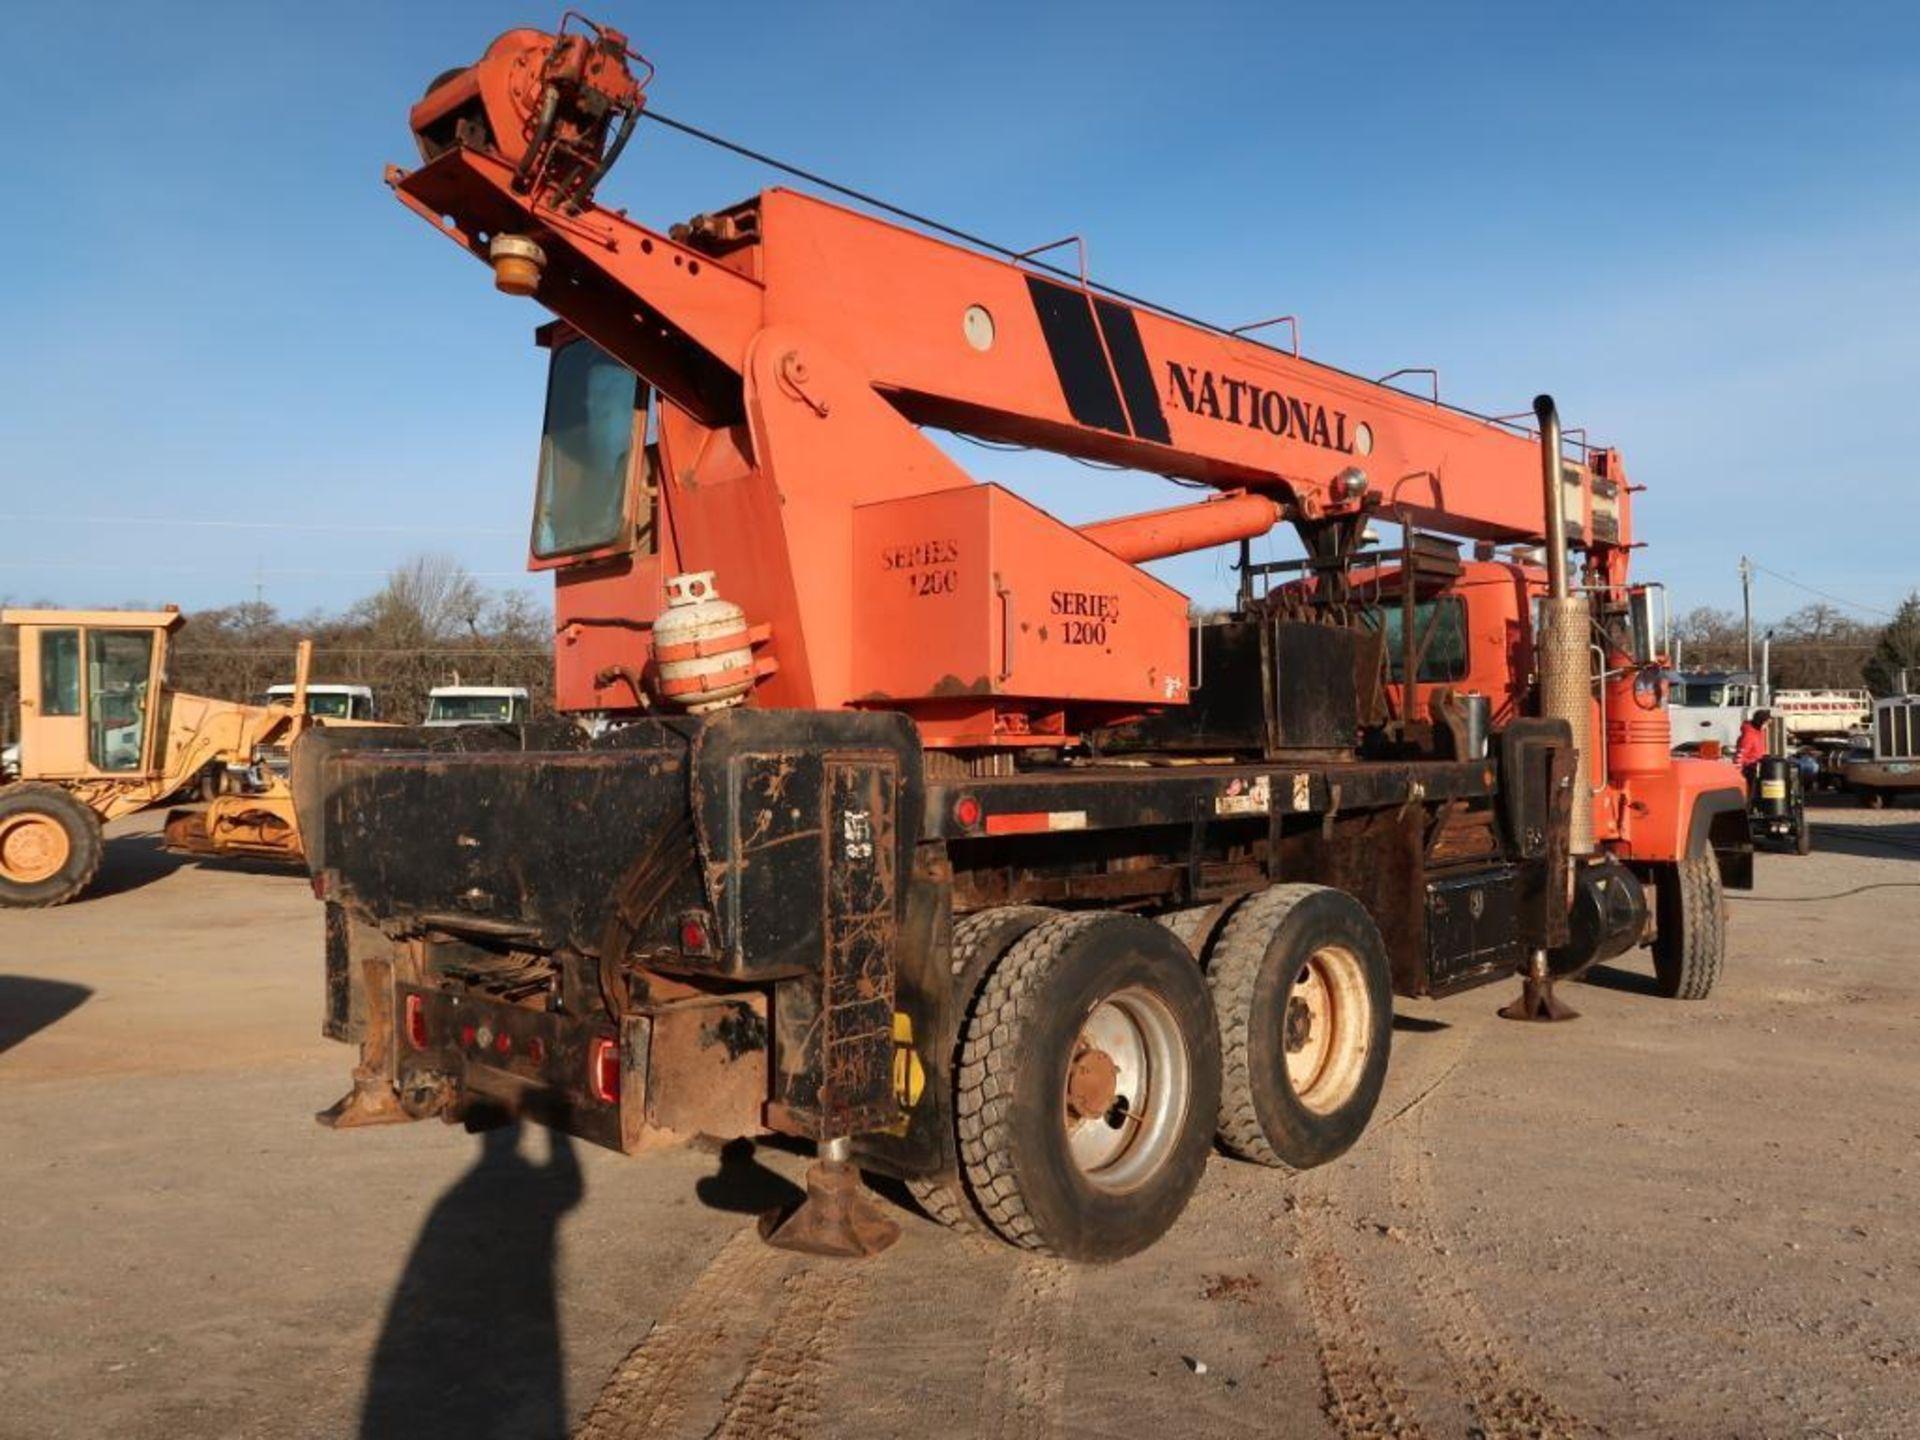 Lot 107 - 1993 Mack RD690S, Flat Bed Crane Truck, complete w/National 1200 Series Boom Crane, 12.0L L6 Diesel,